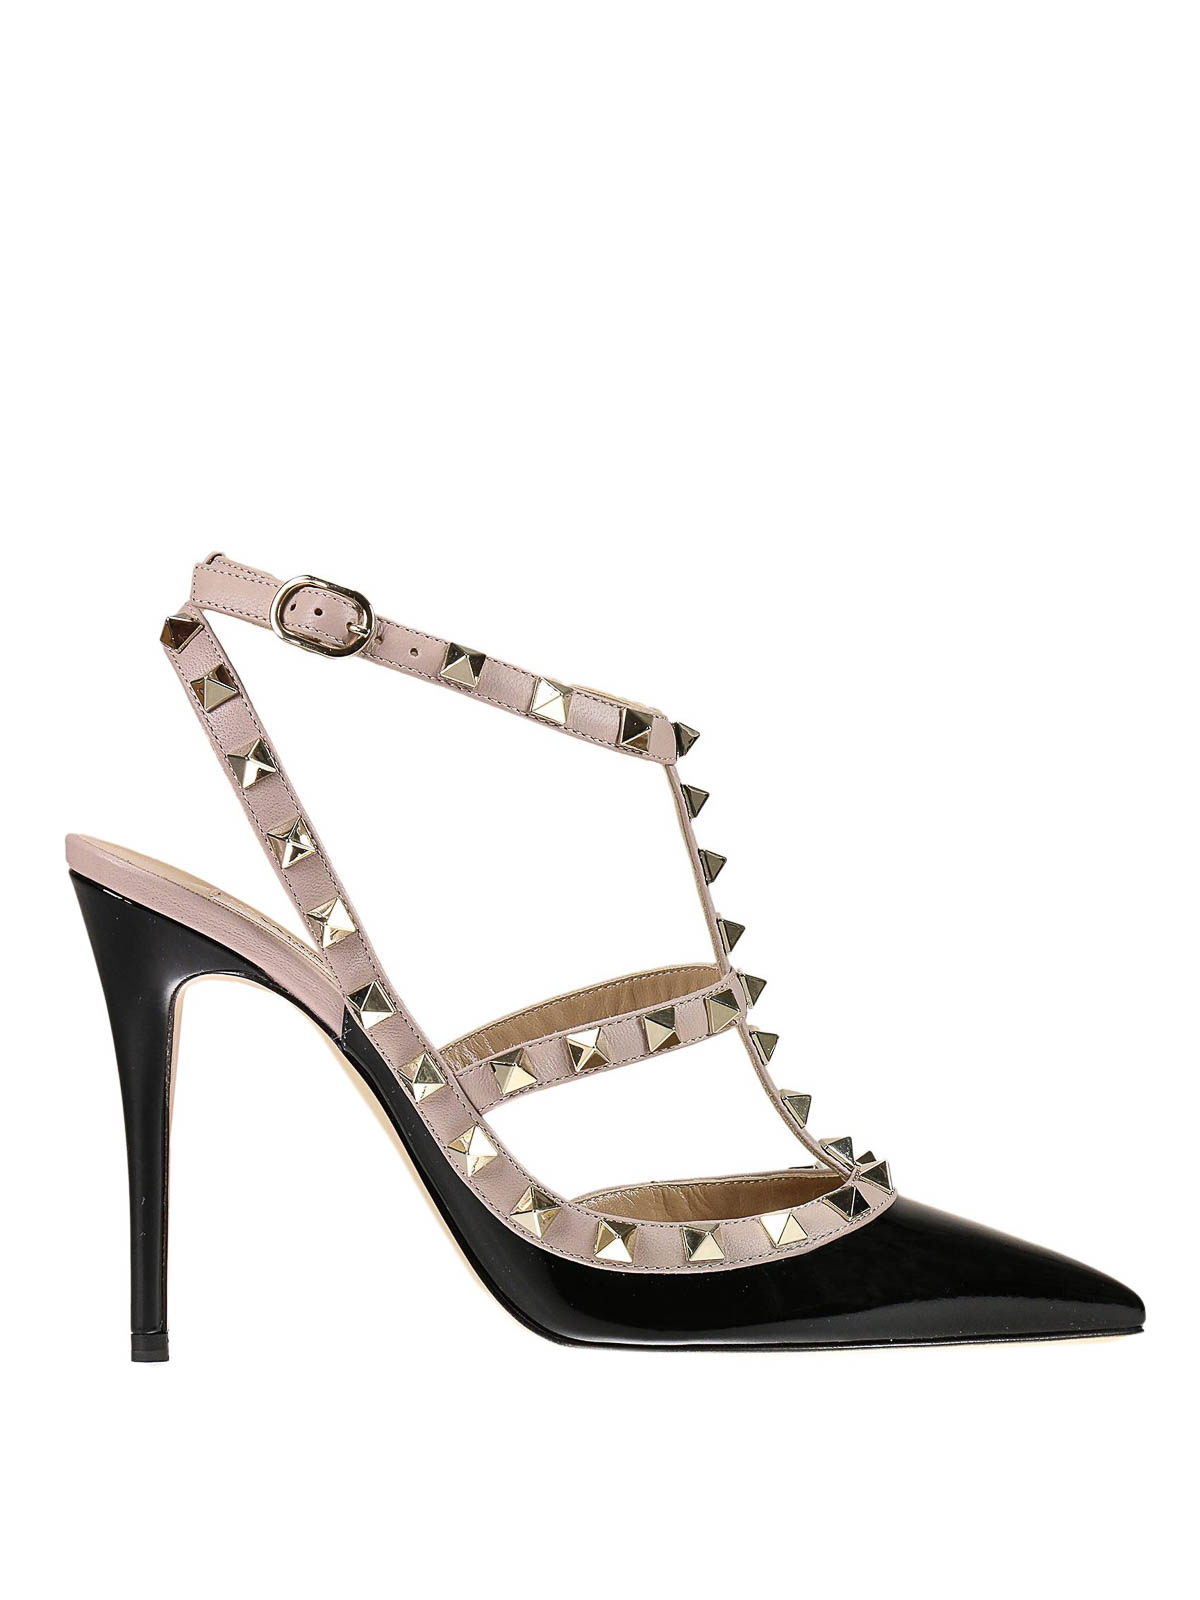 397b6bd7ea0 Valentino Garavani - Rockstud patent slingback pumps - court shoes ...